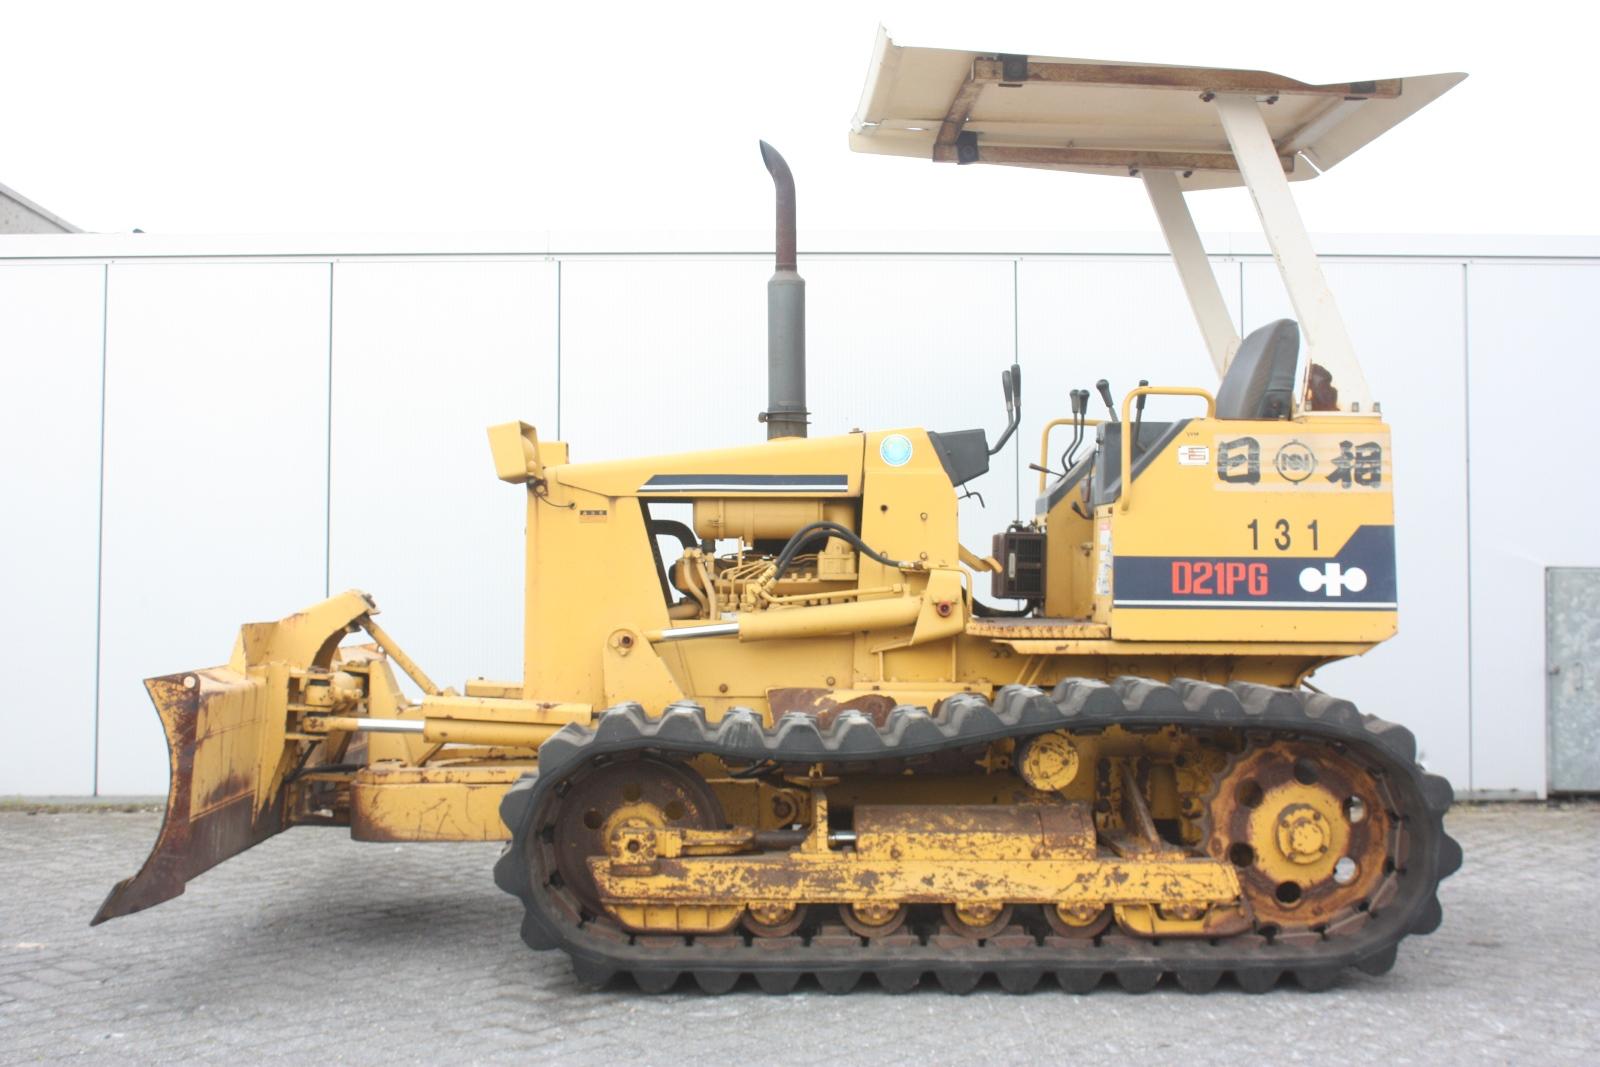 Komatsu dozer d21p - Komatsu D21P-8 Crawler Dozers for Sale | CEG